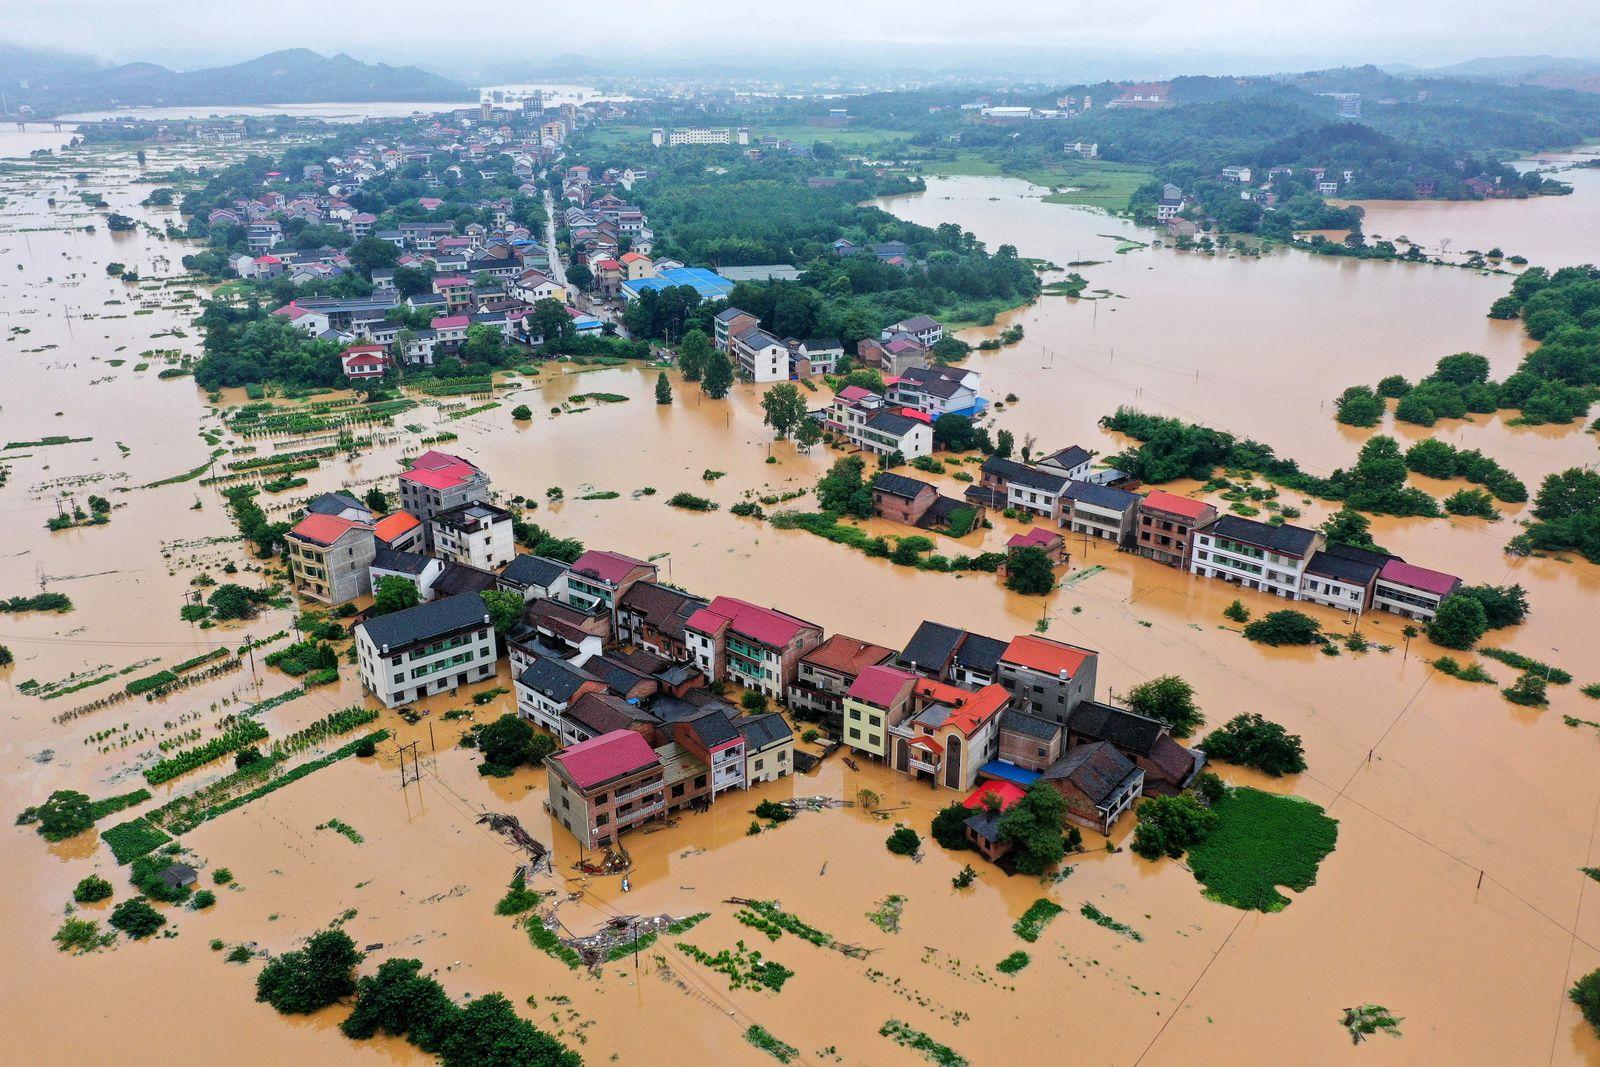 TOPSHOT-CHINA-FLOOD